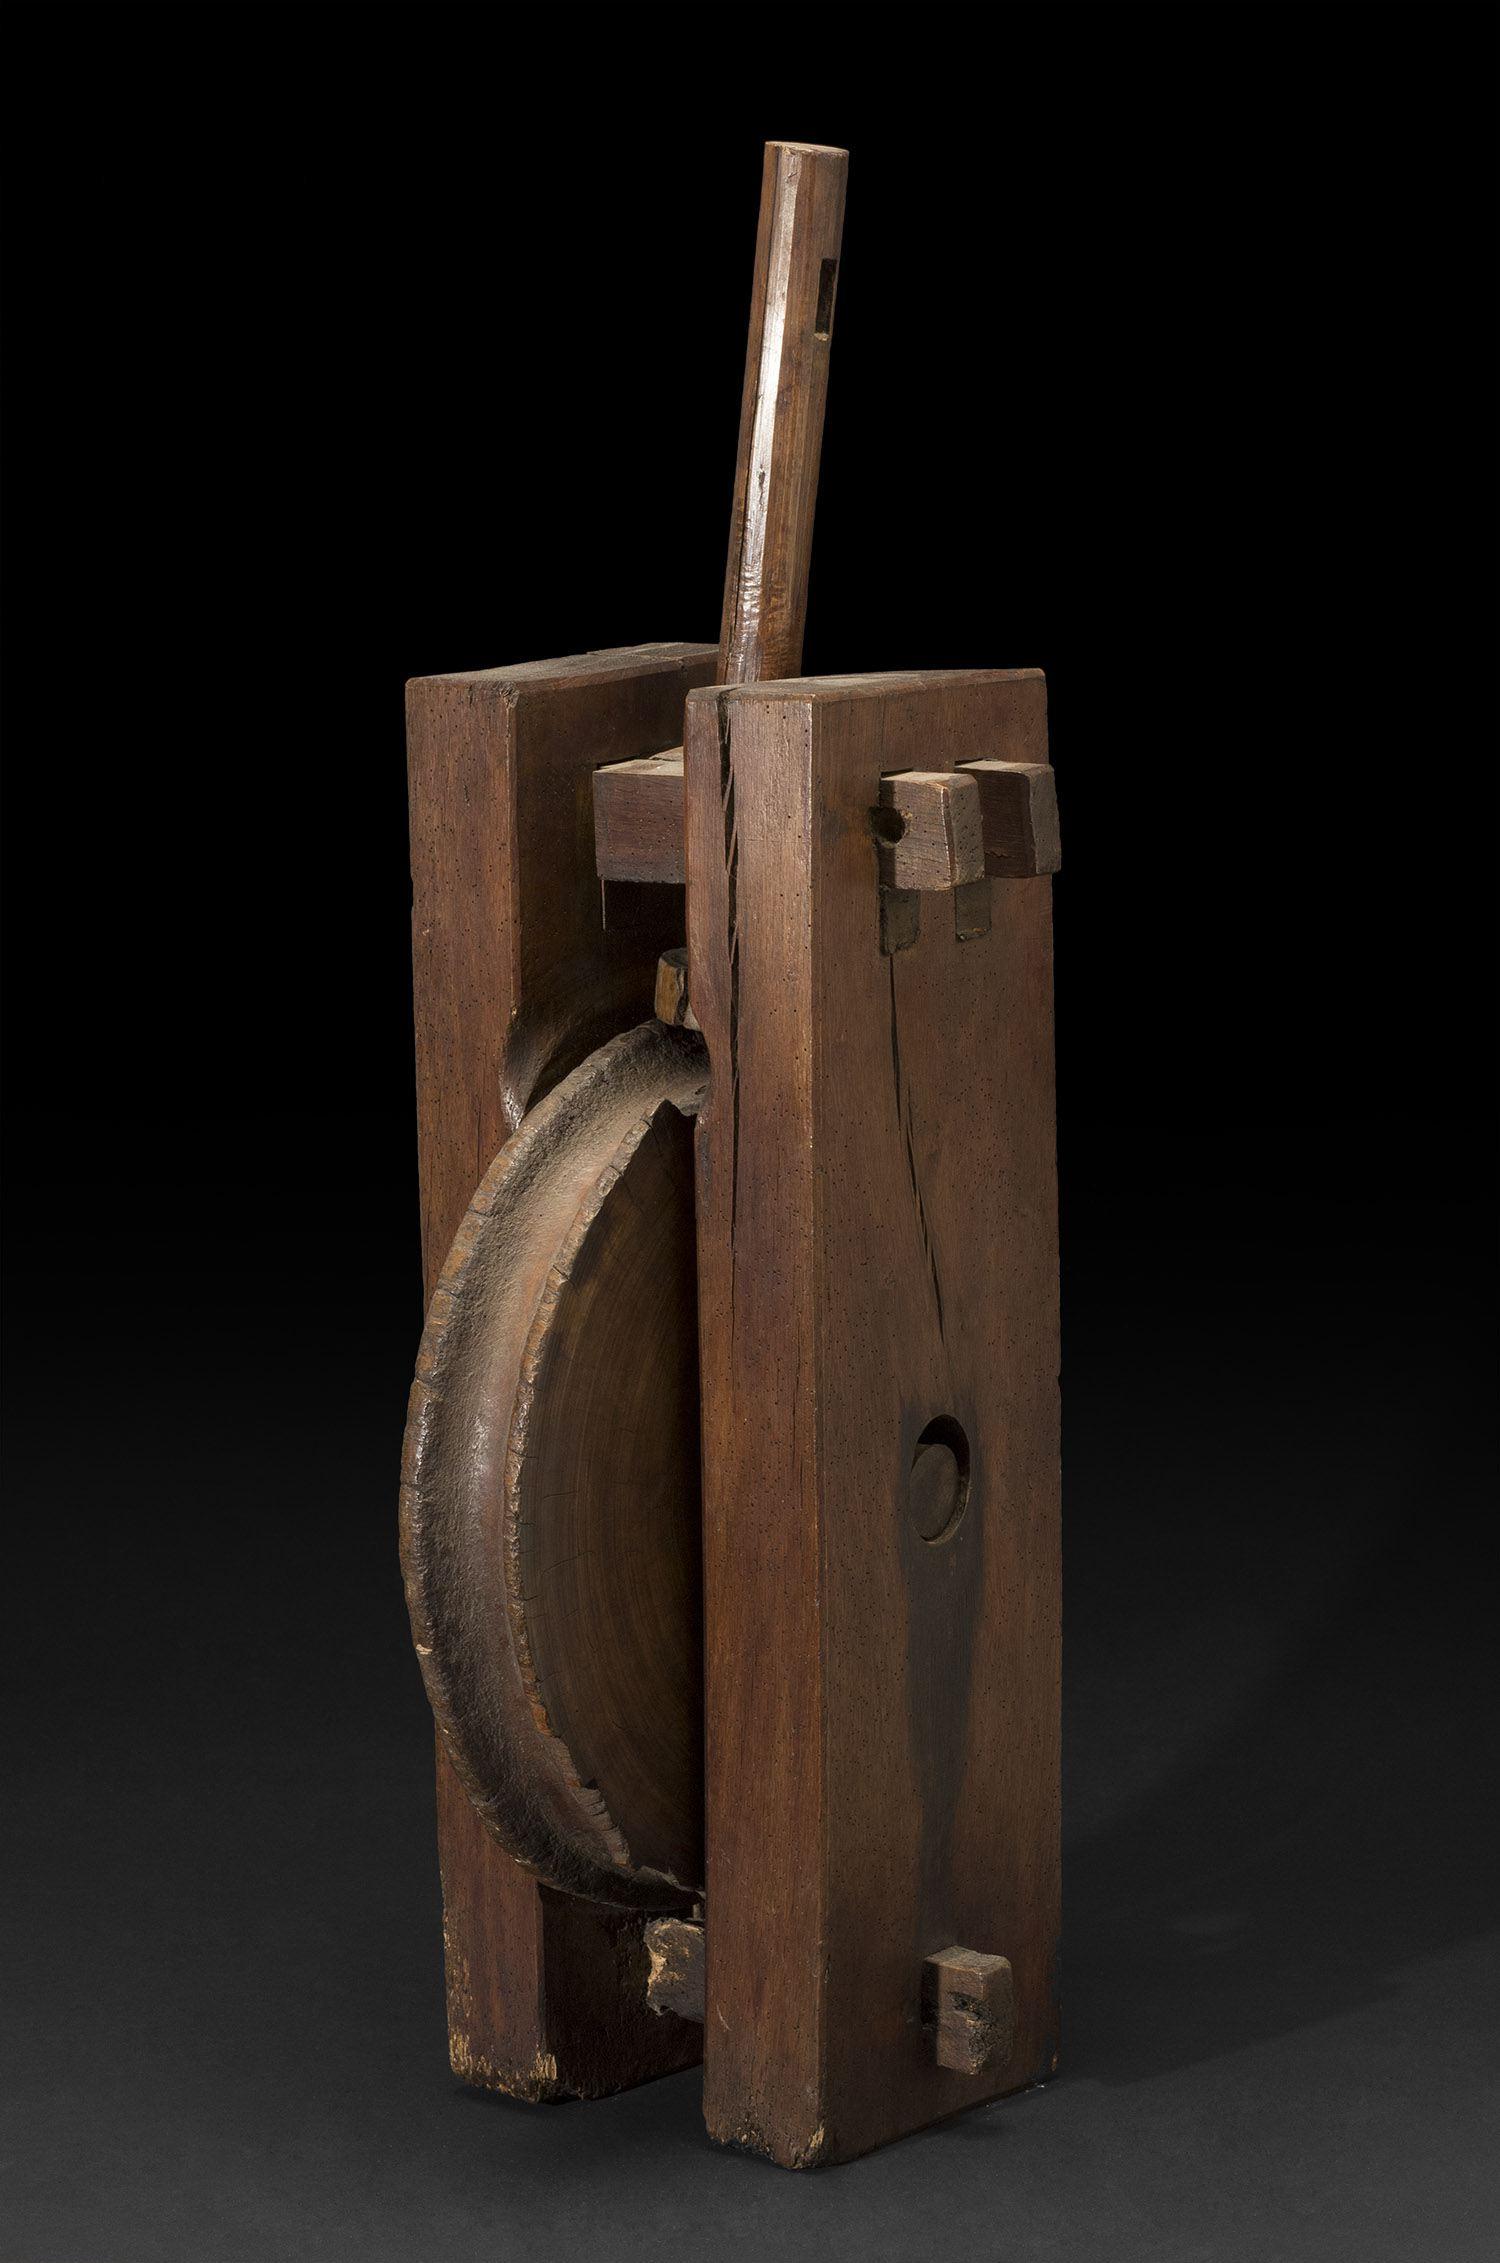 Japan    Well Wheel  , Early 20th Century Wood 33 x 14 x 10.5 inches 83.8 x 35.6 x 26.7 cm JA 648